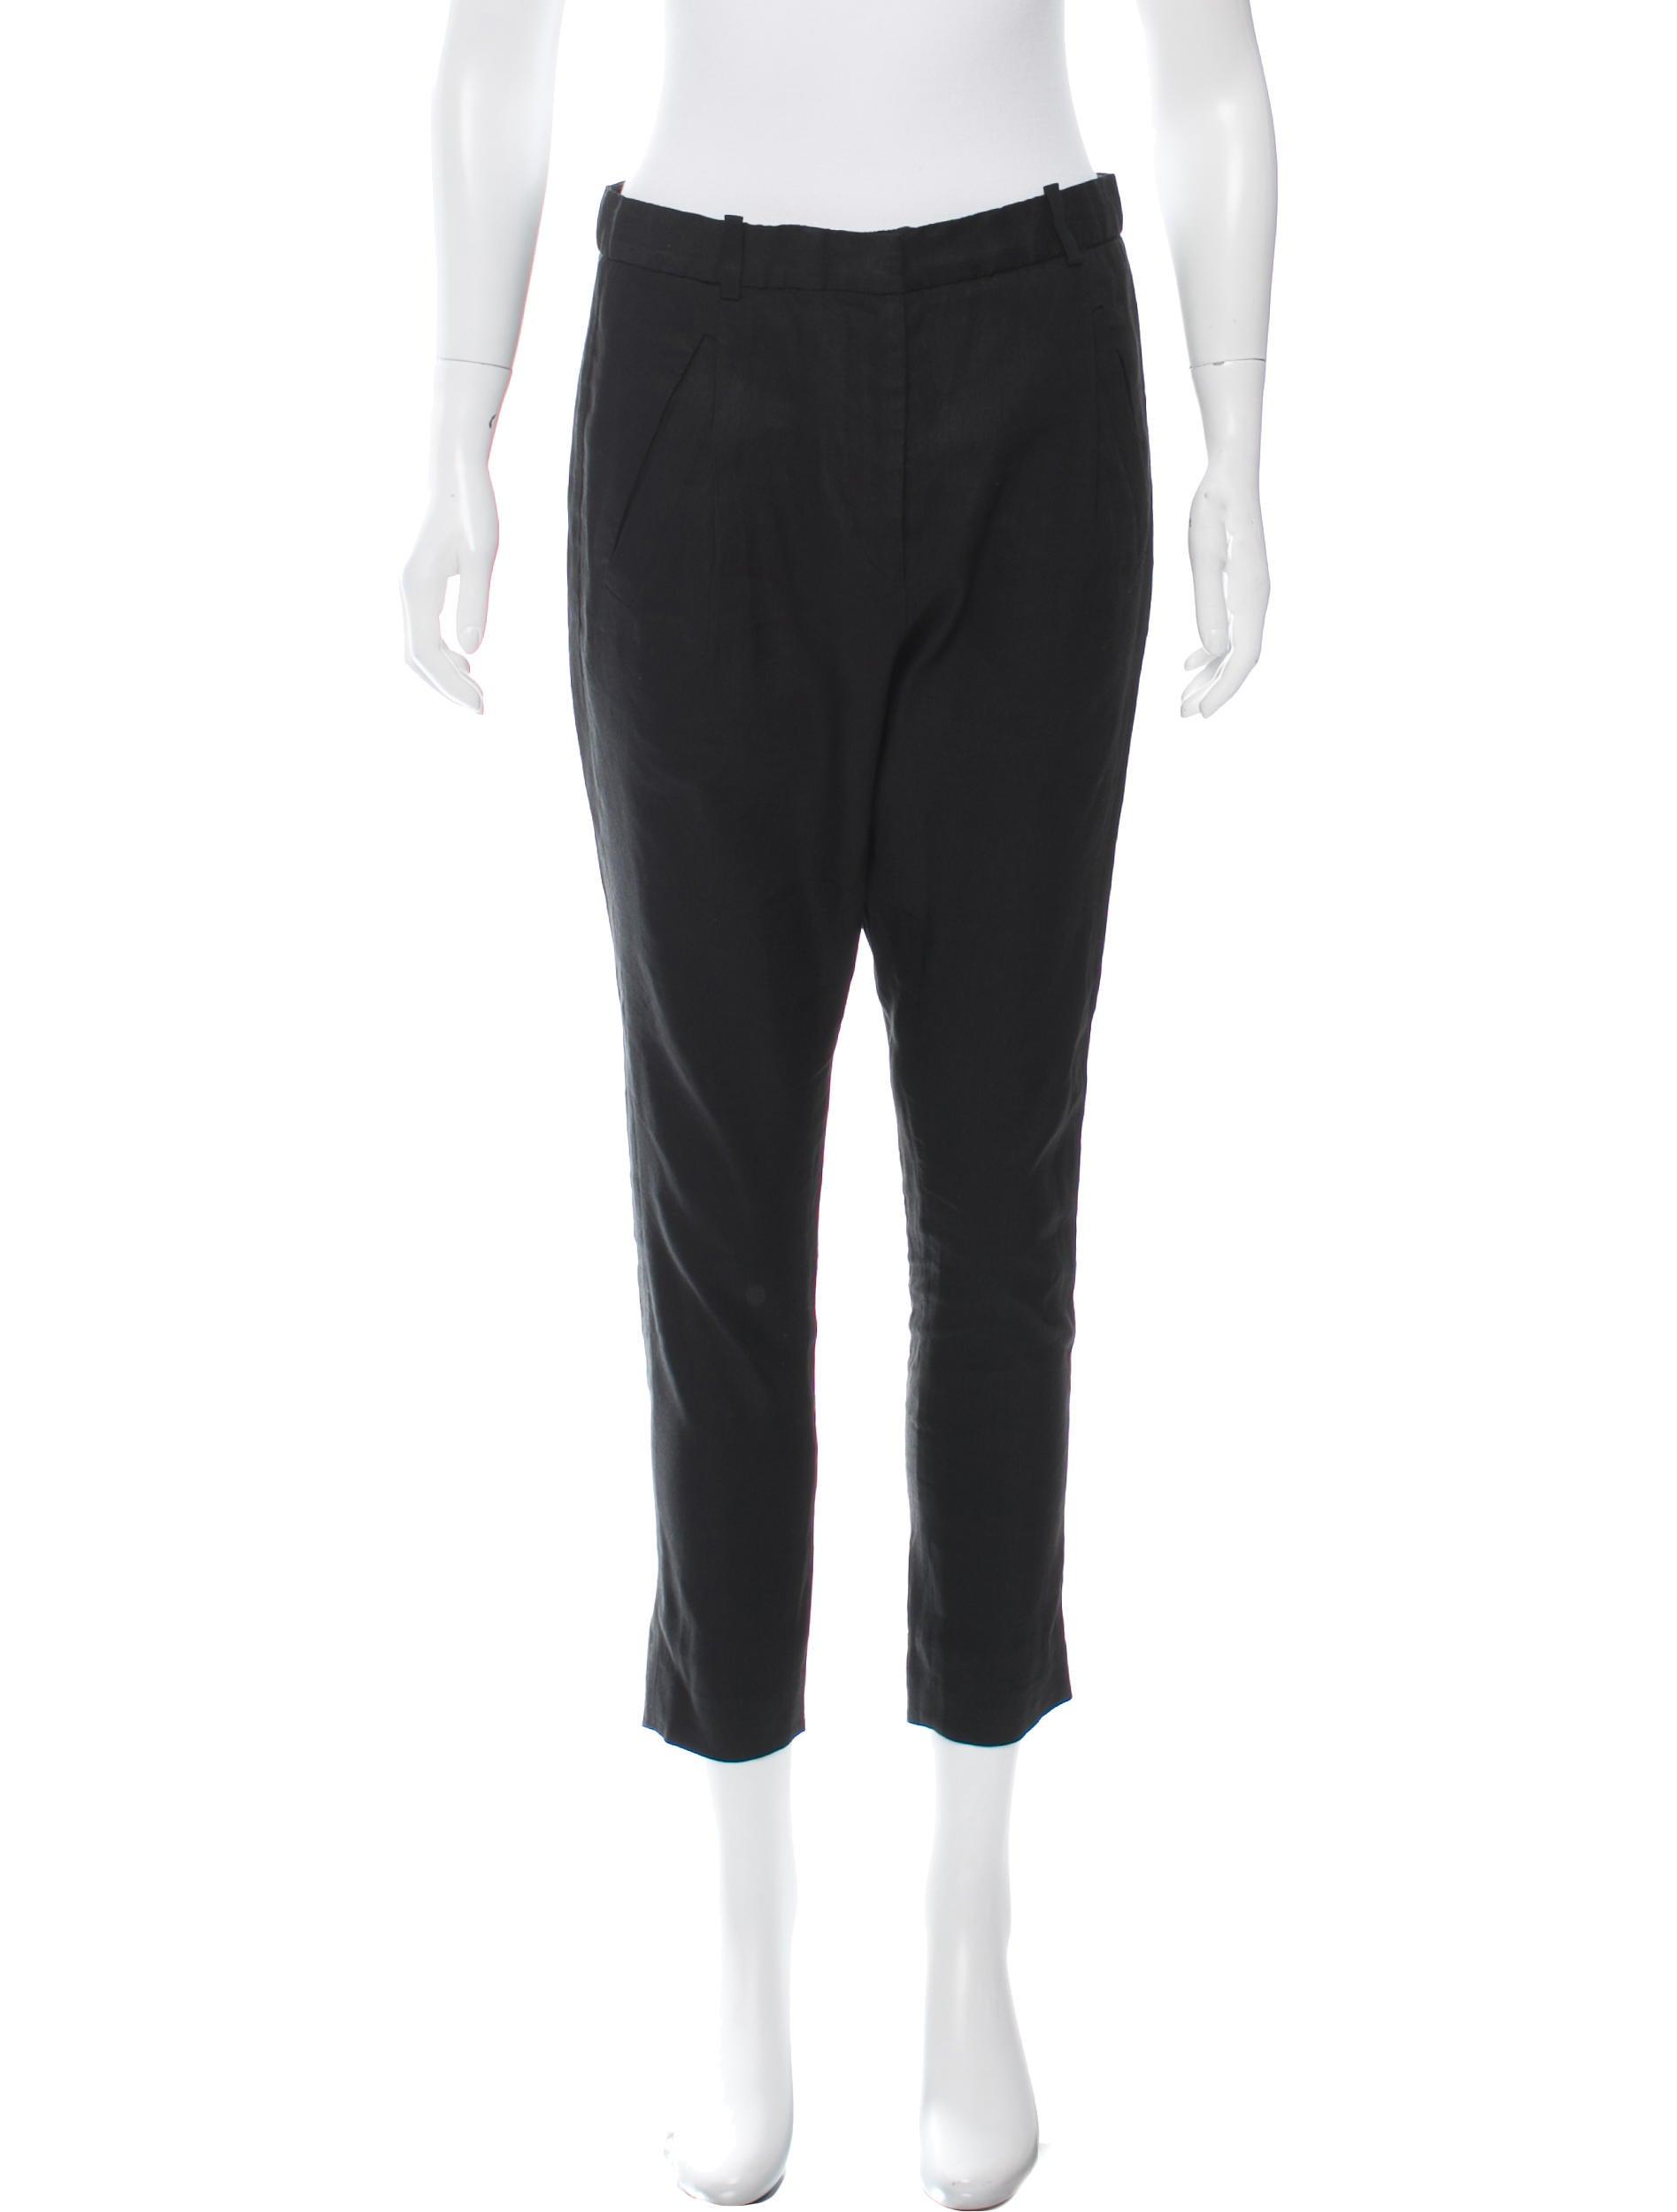 Model Vince Womens Tapered Pleated Dress Pants - Walmart.com